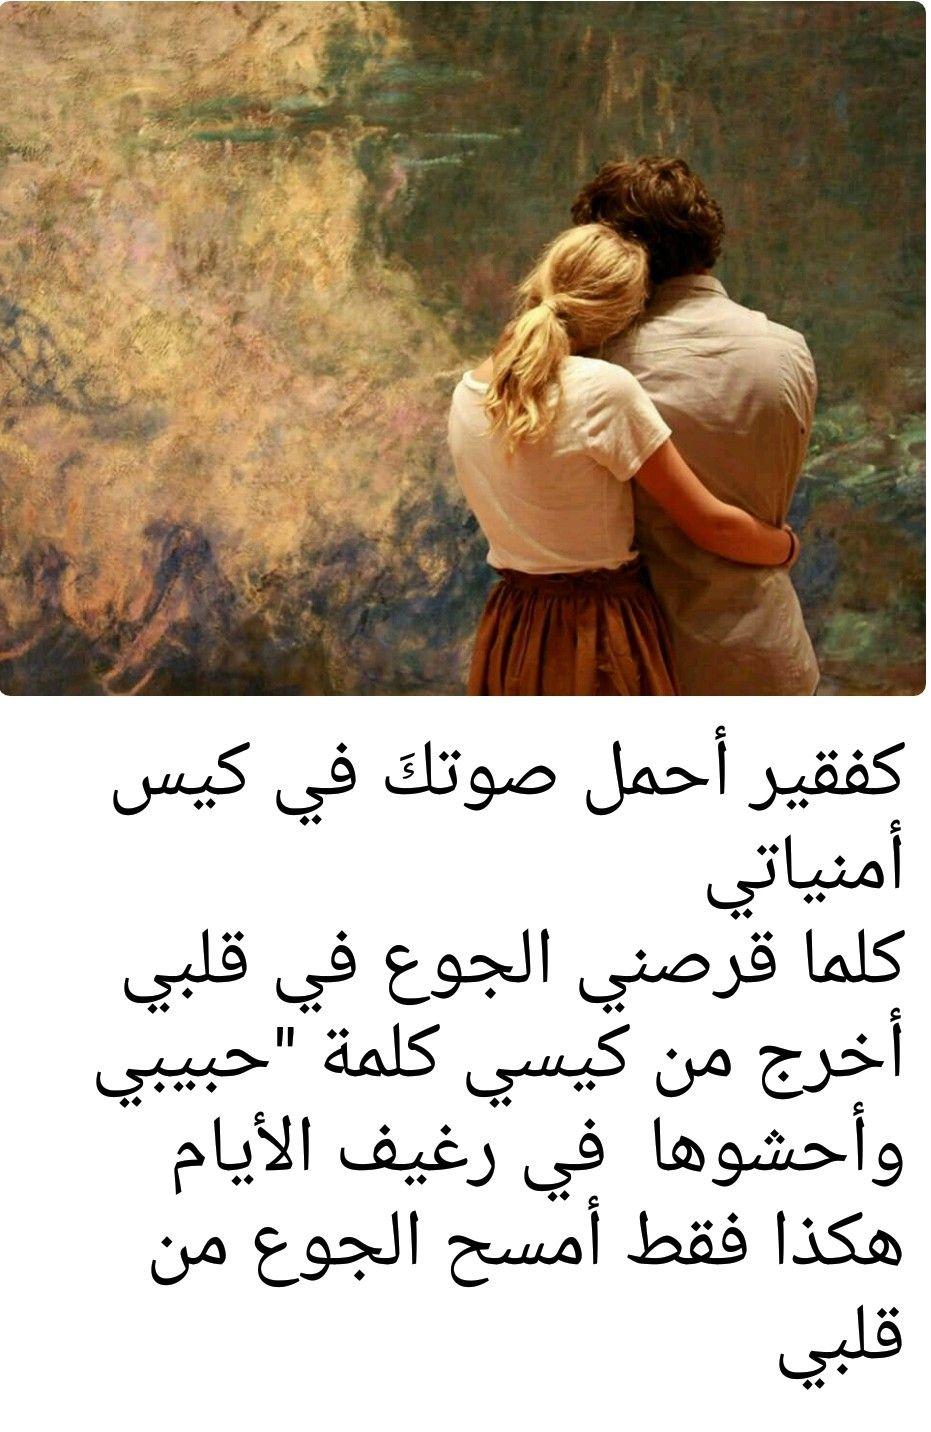 نوران الحسيني بوح Couple Photos Photo Movies